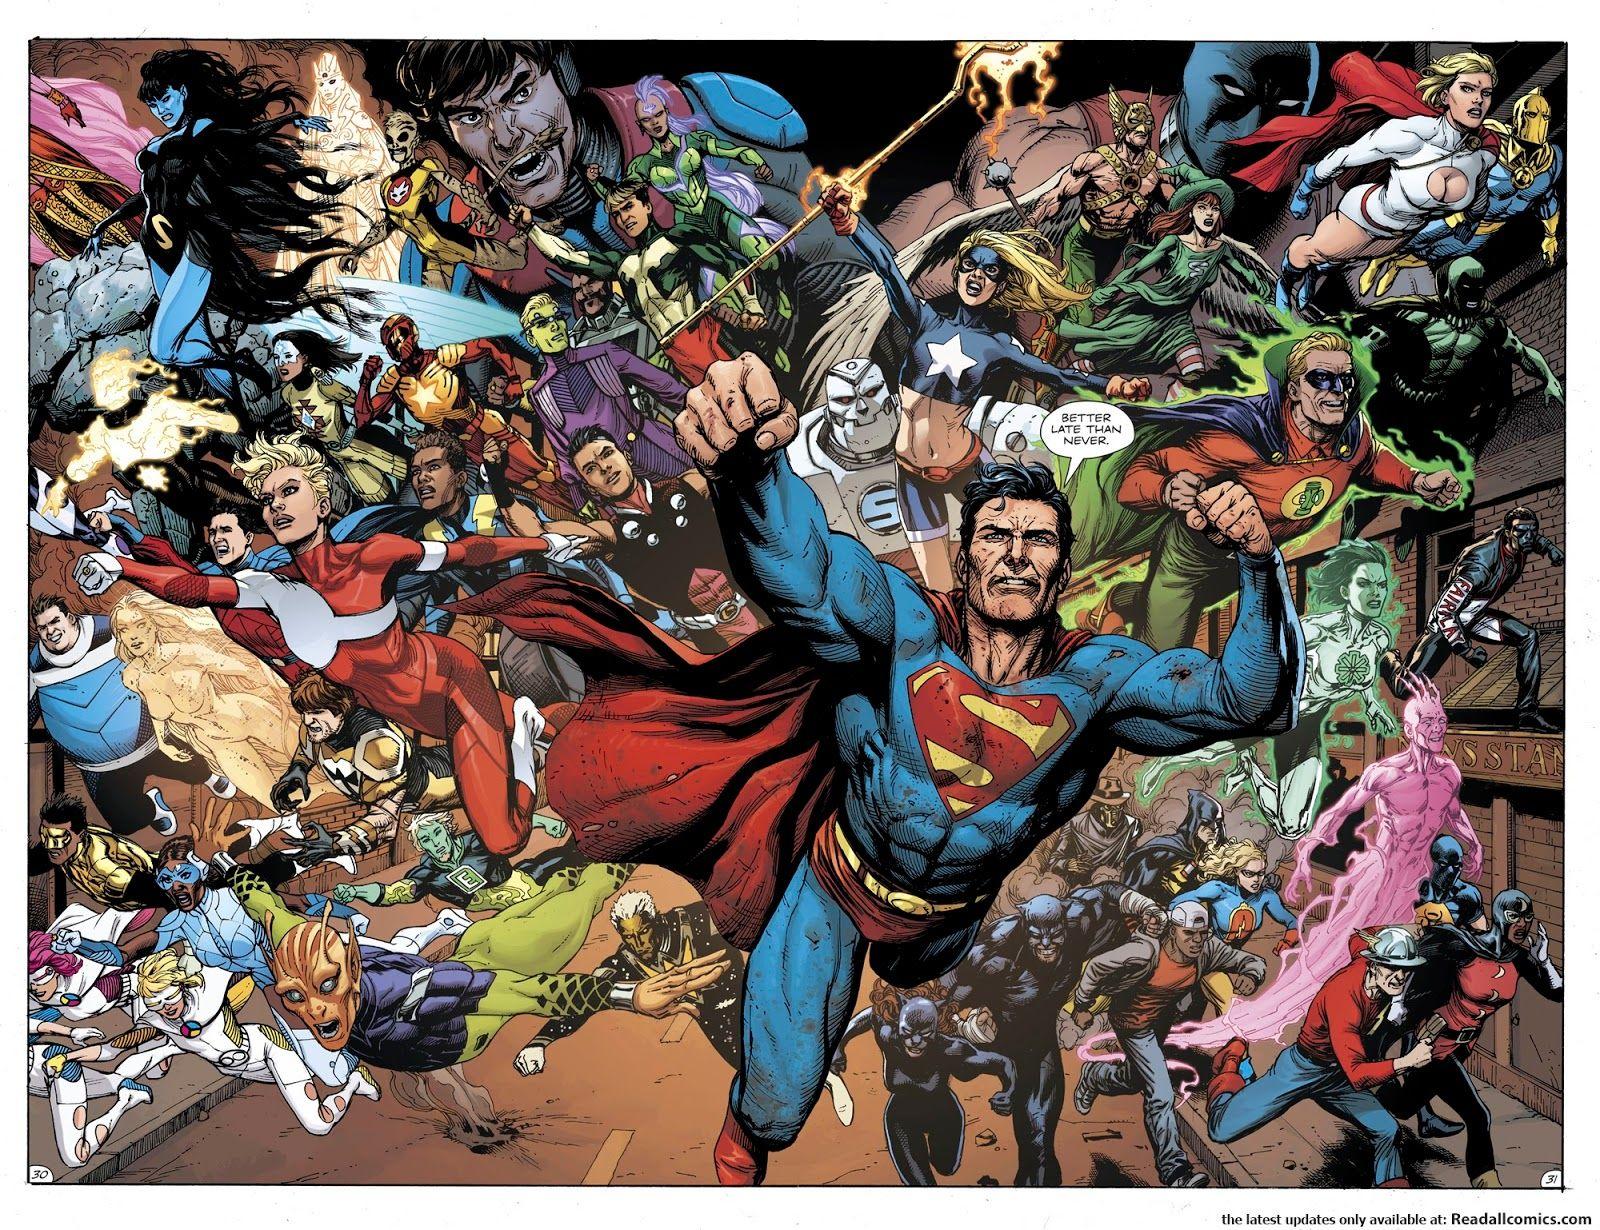 Doomsday Clock 12 In 2020 Doomsday Clock Comics Comic Books Art